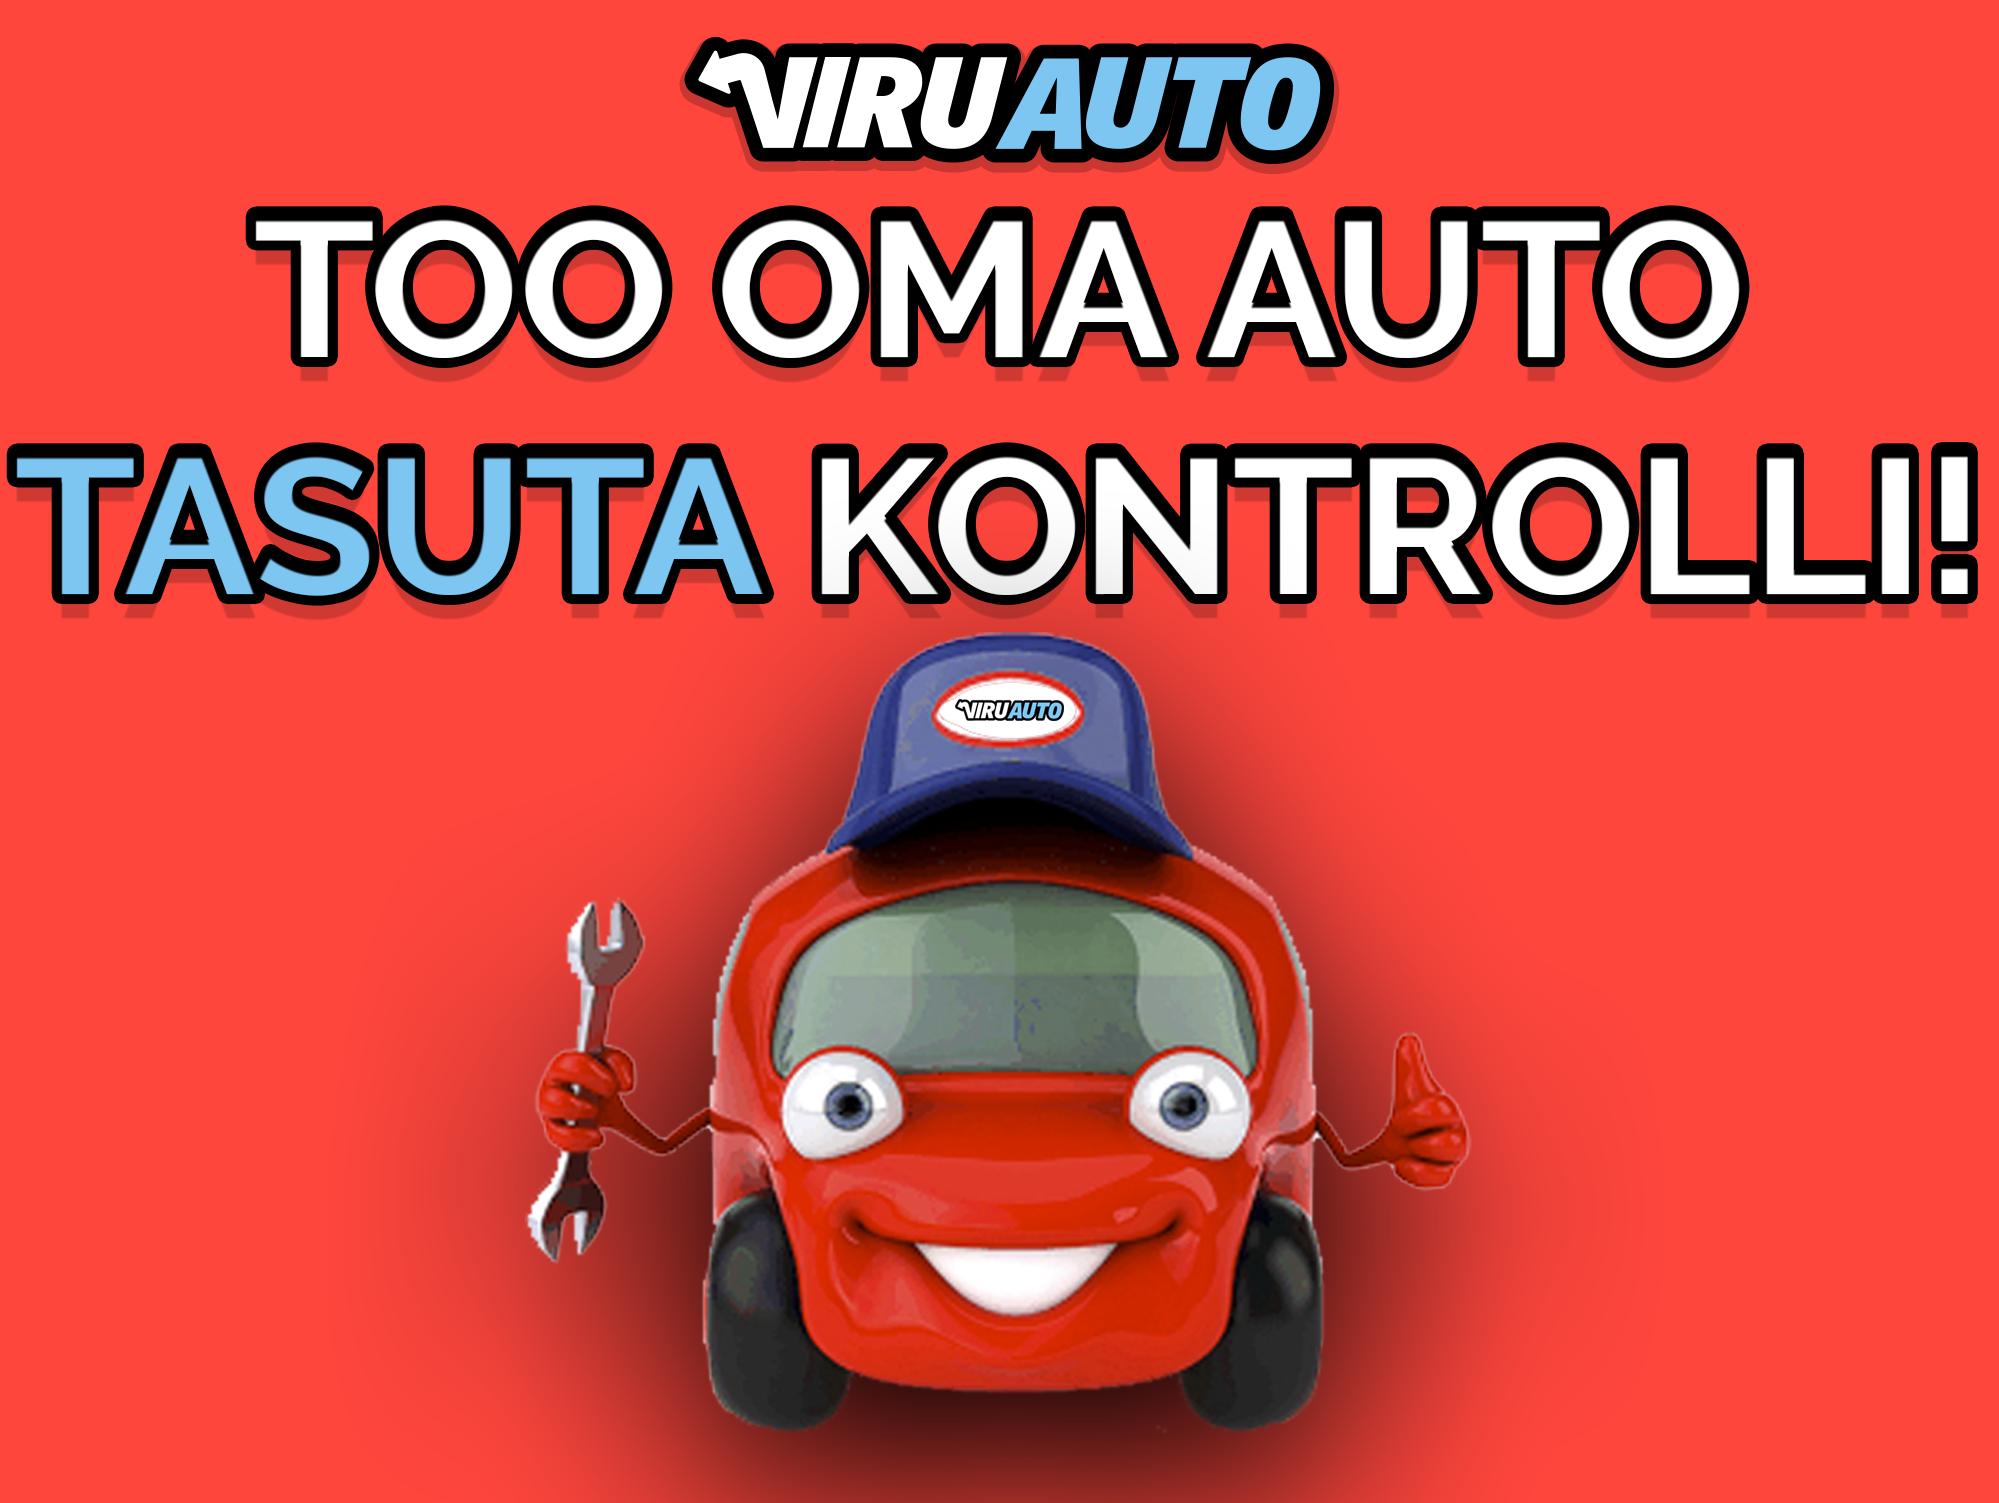 auto tehniline kontroll